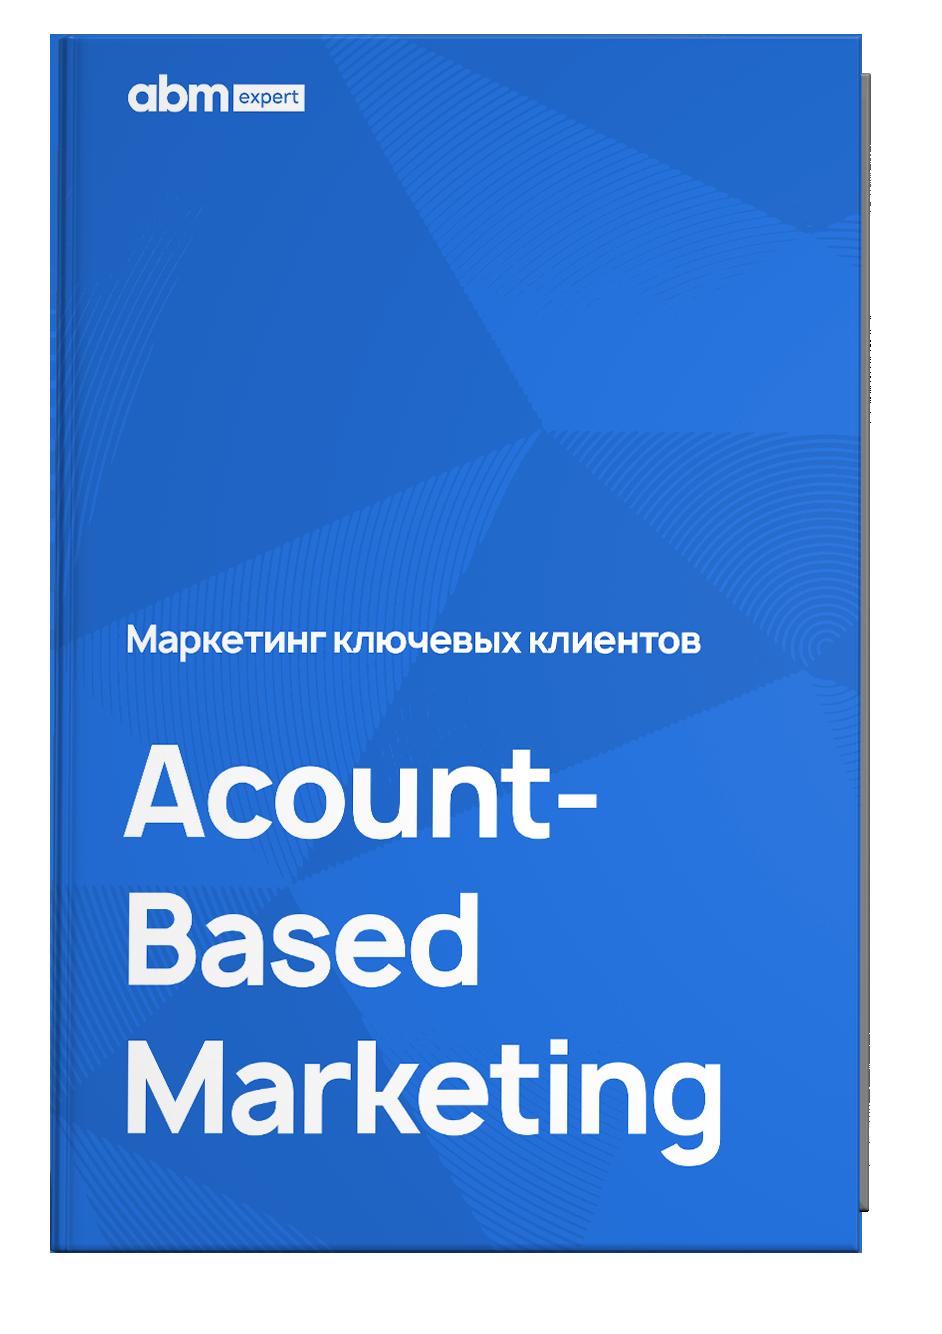 Книга account-based мarketing от ABM expert